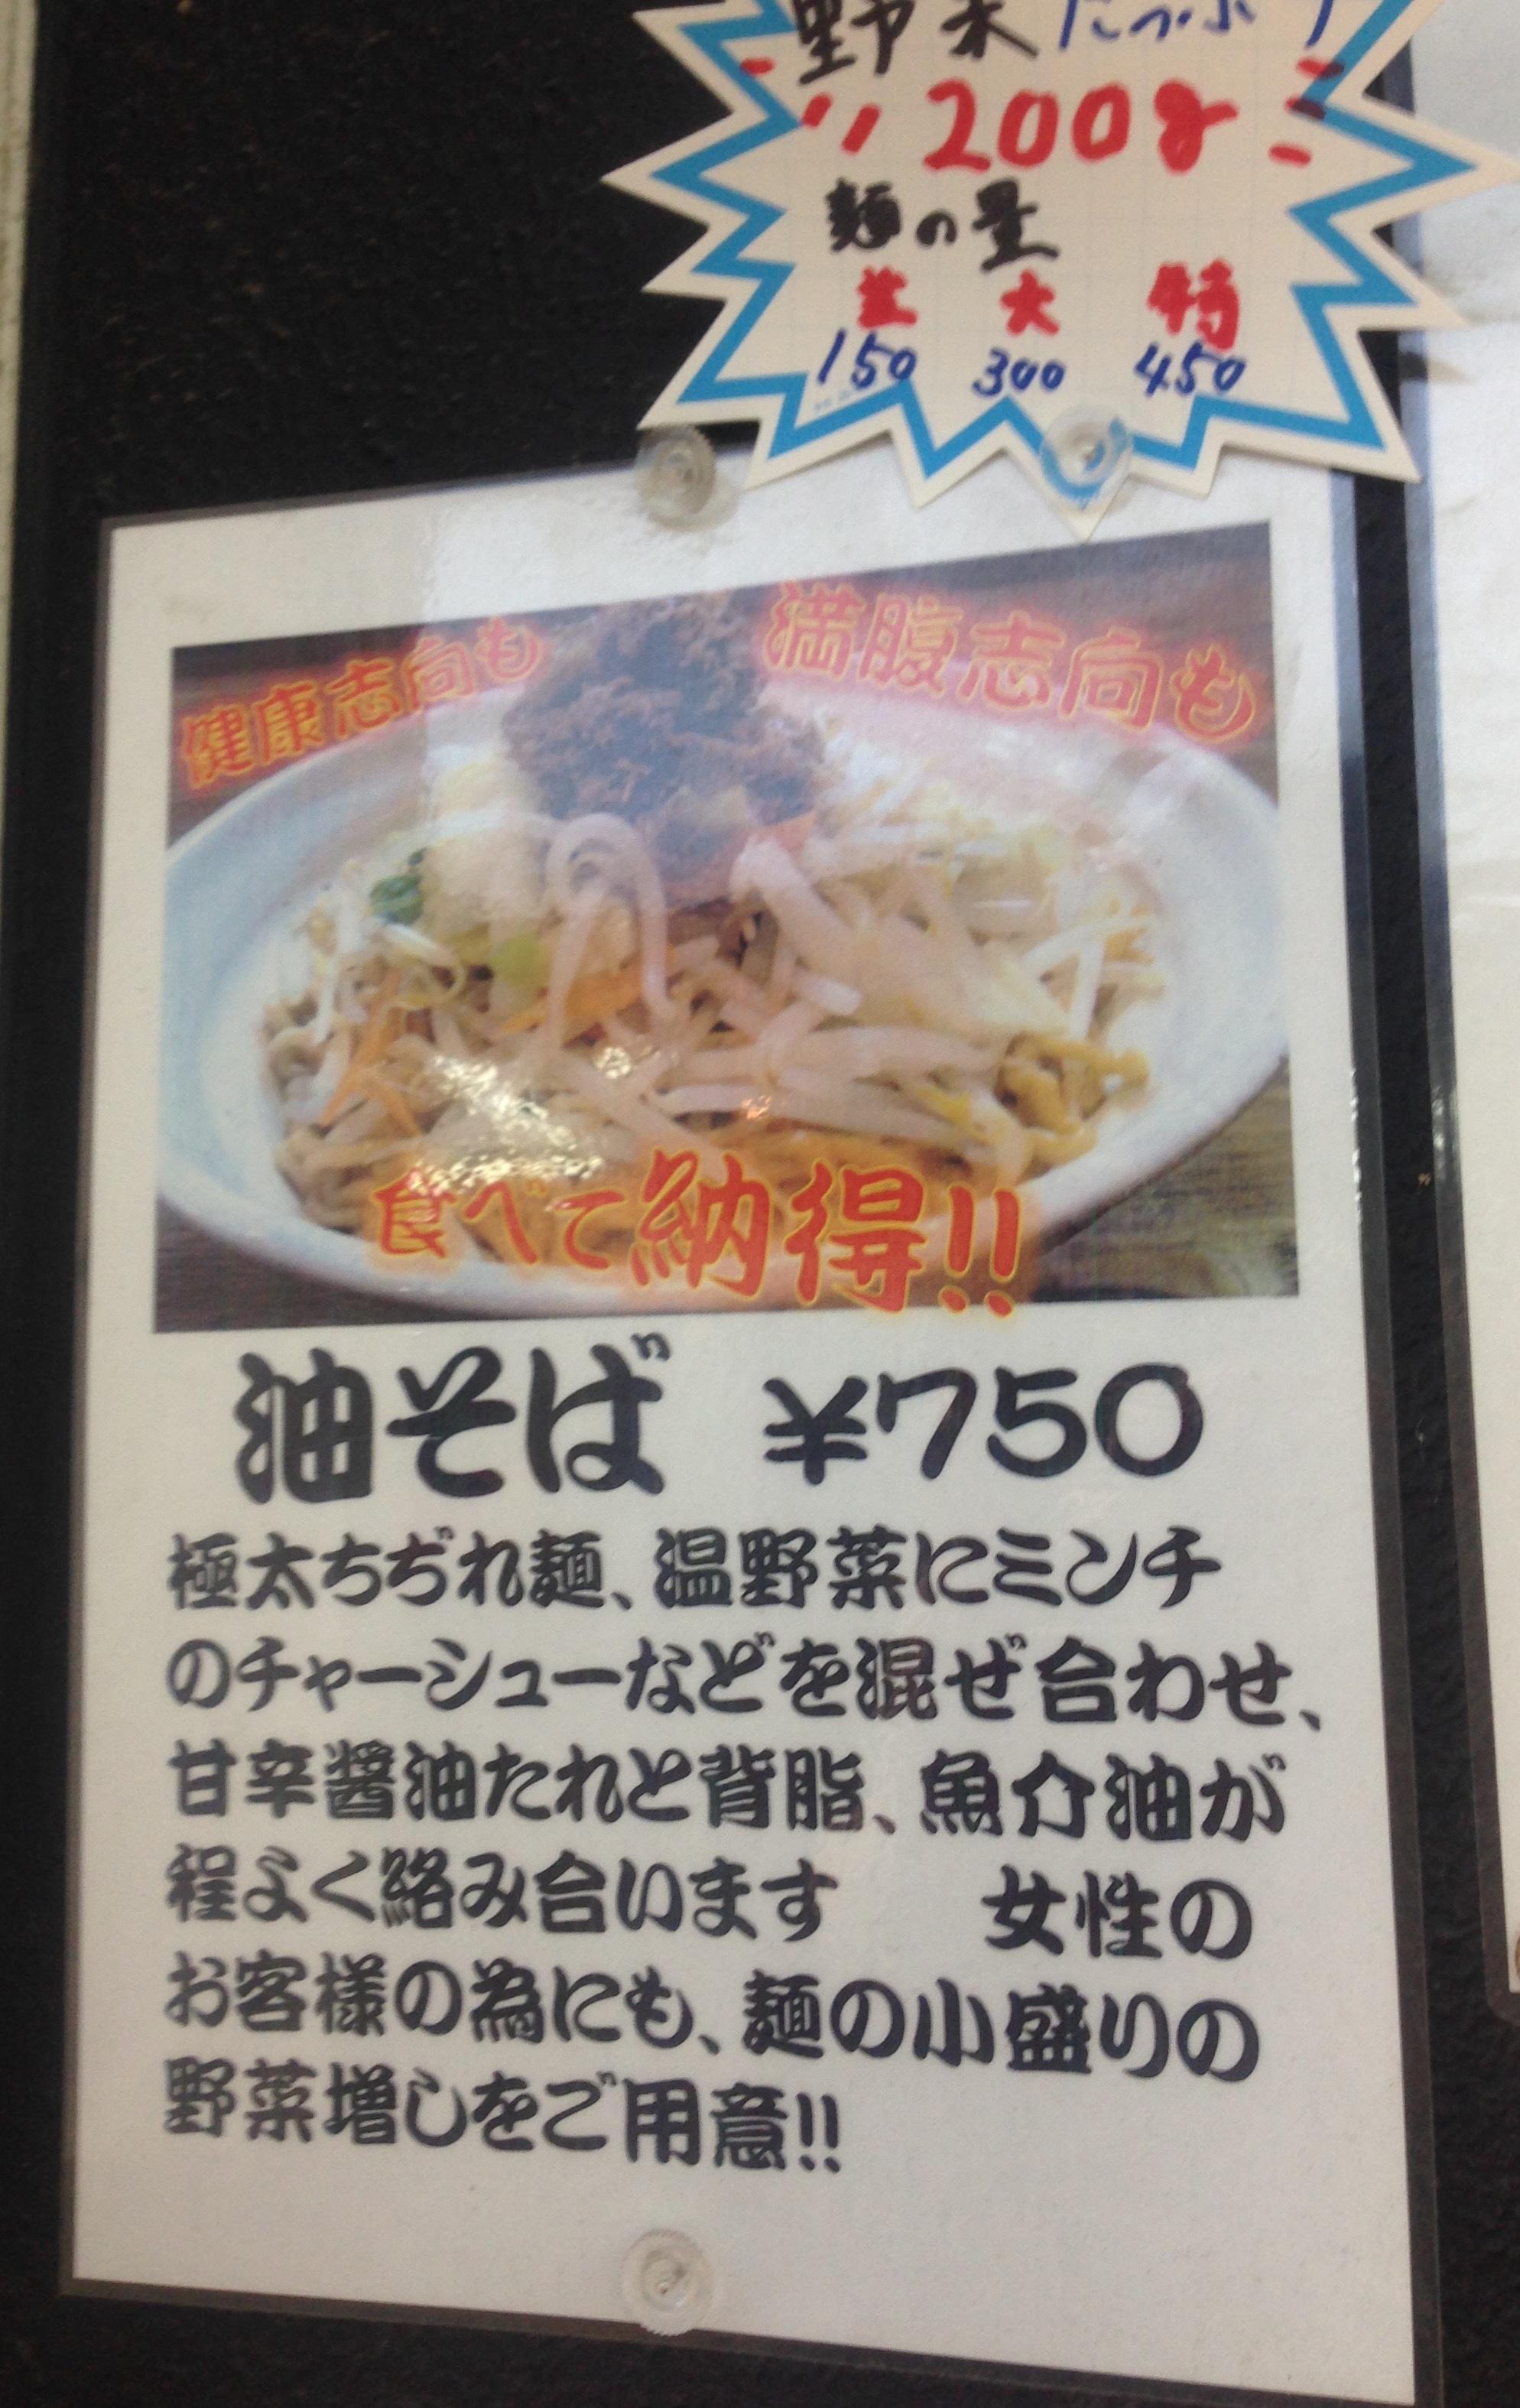 油そば上海麺館 中野区中野5−63−4